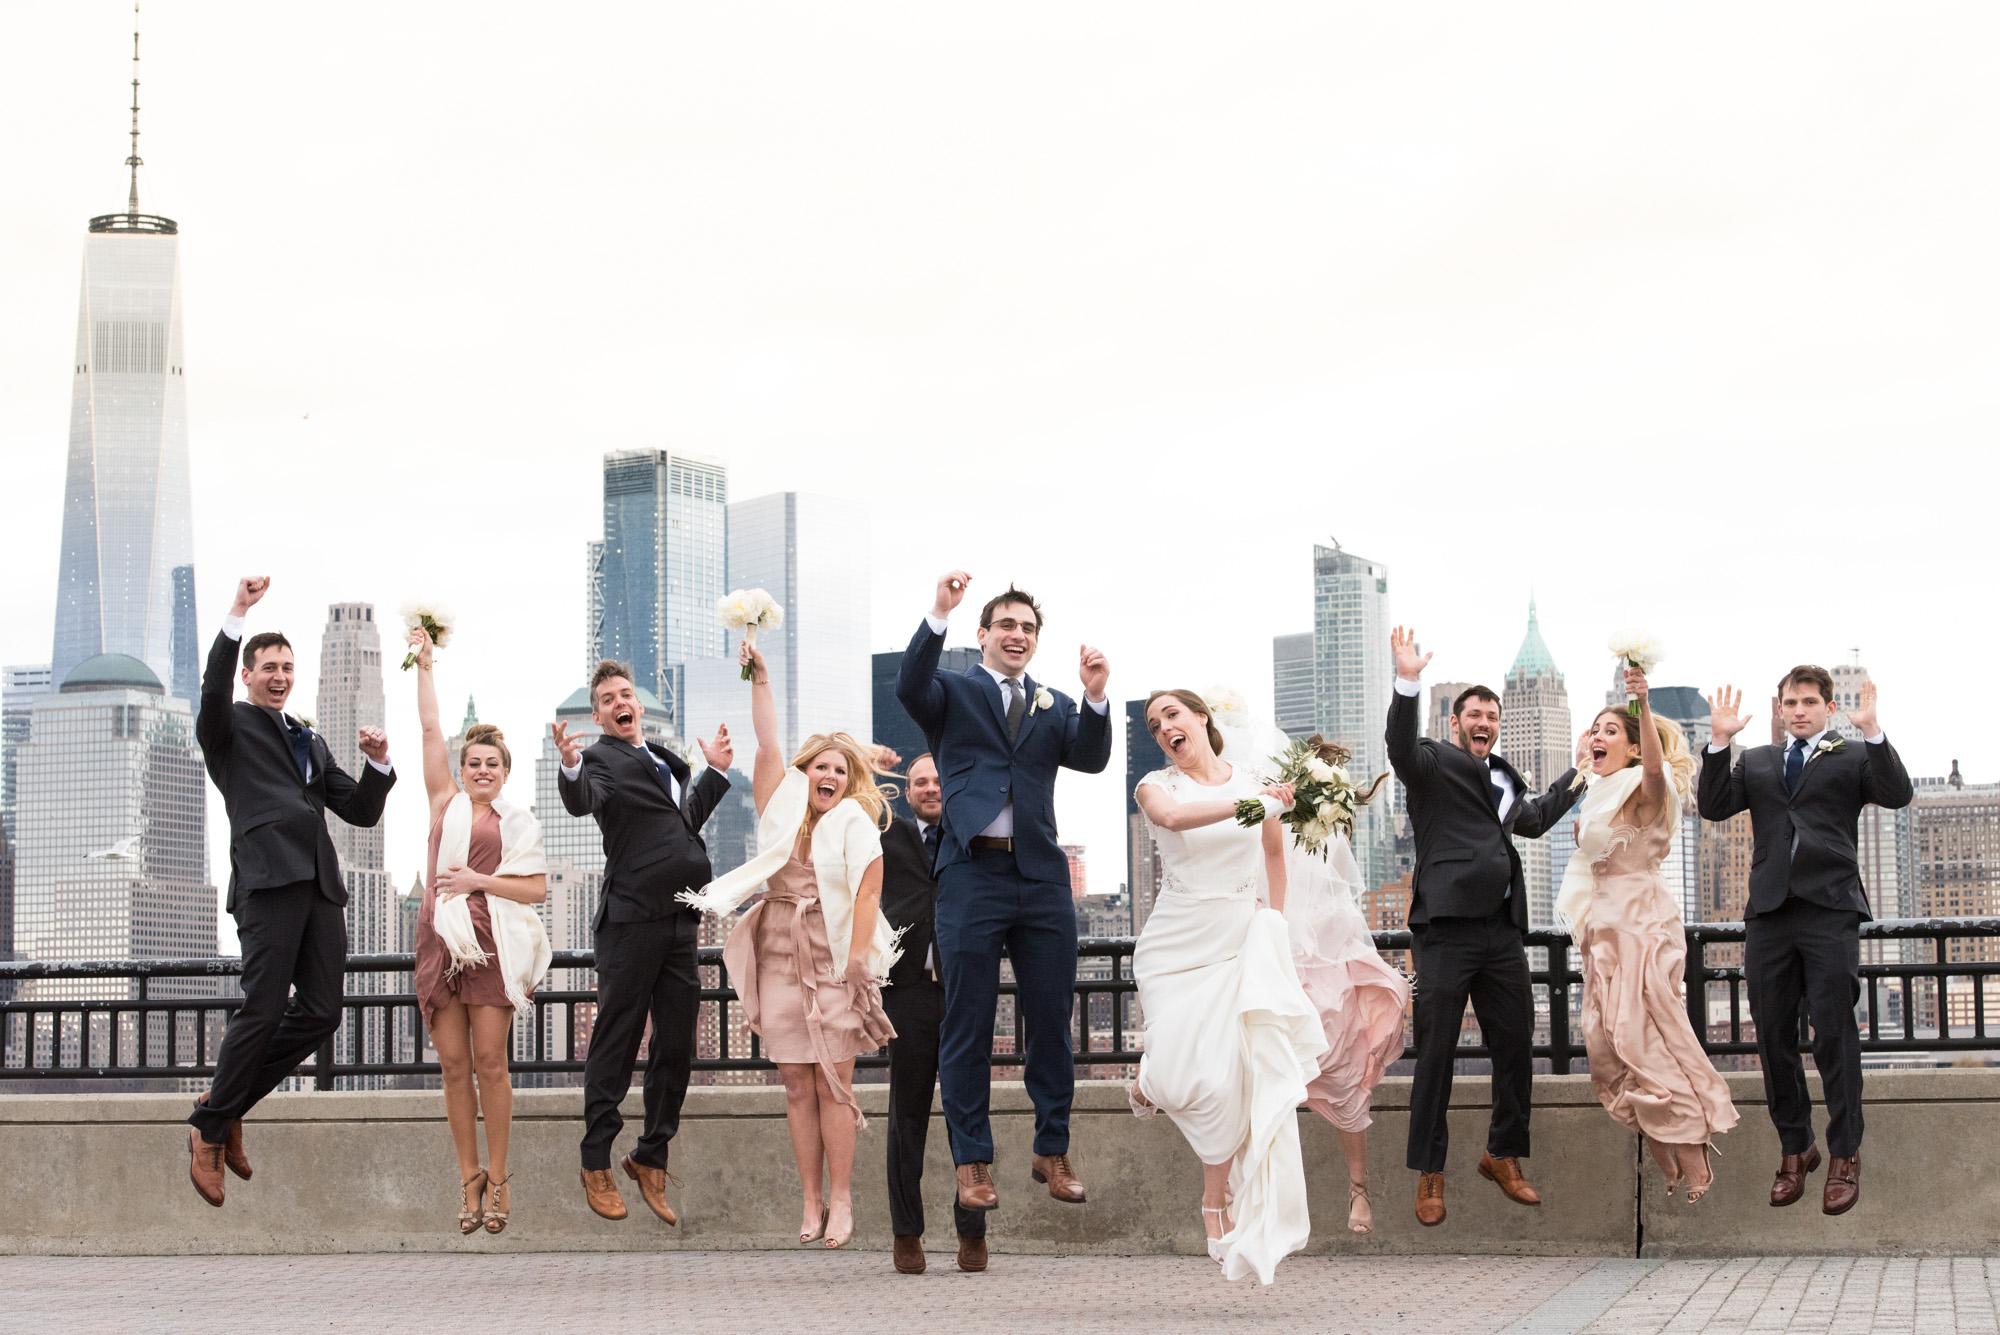 nj-wedding-photographer-maritime-parc-maria-david-24.jpg